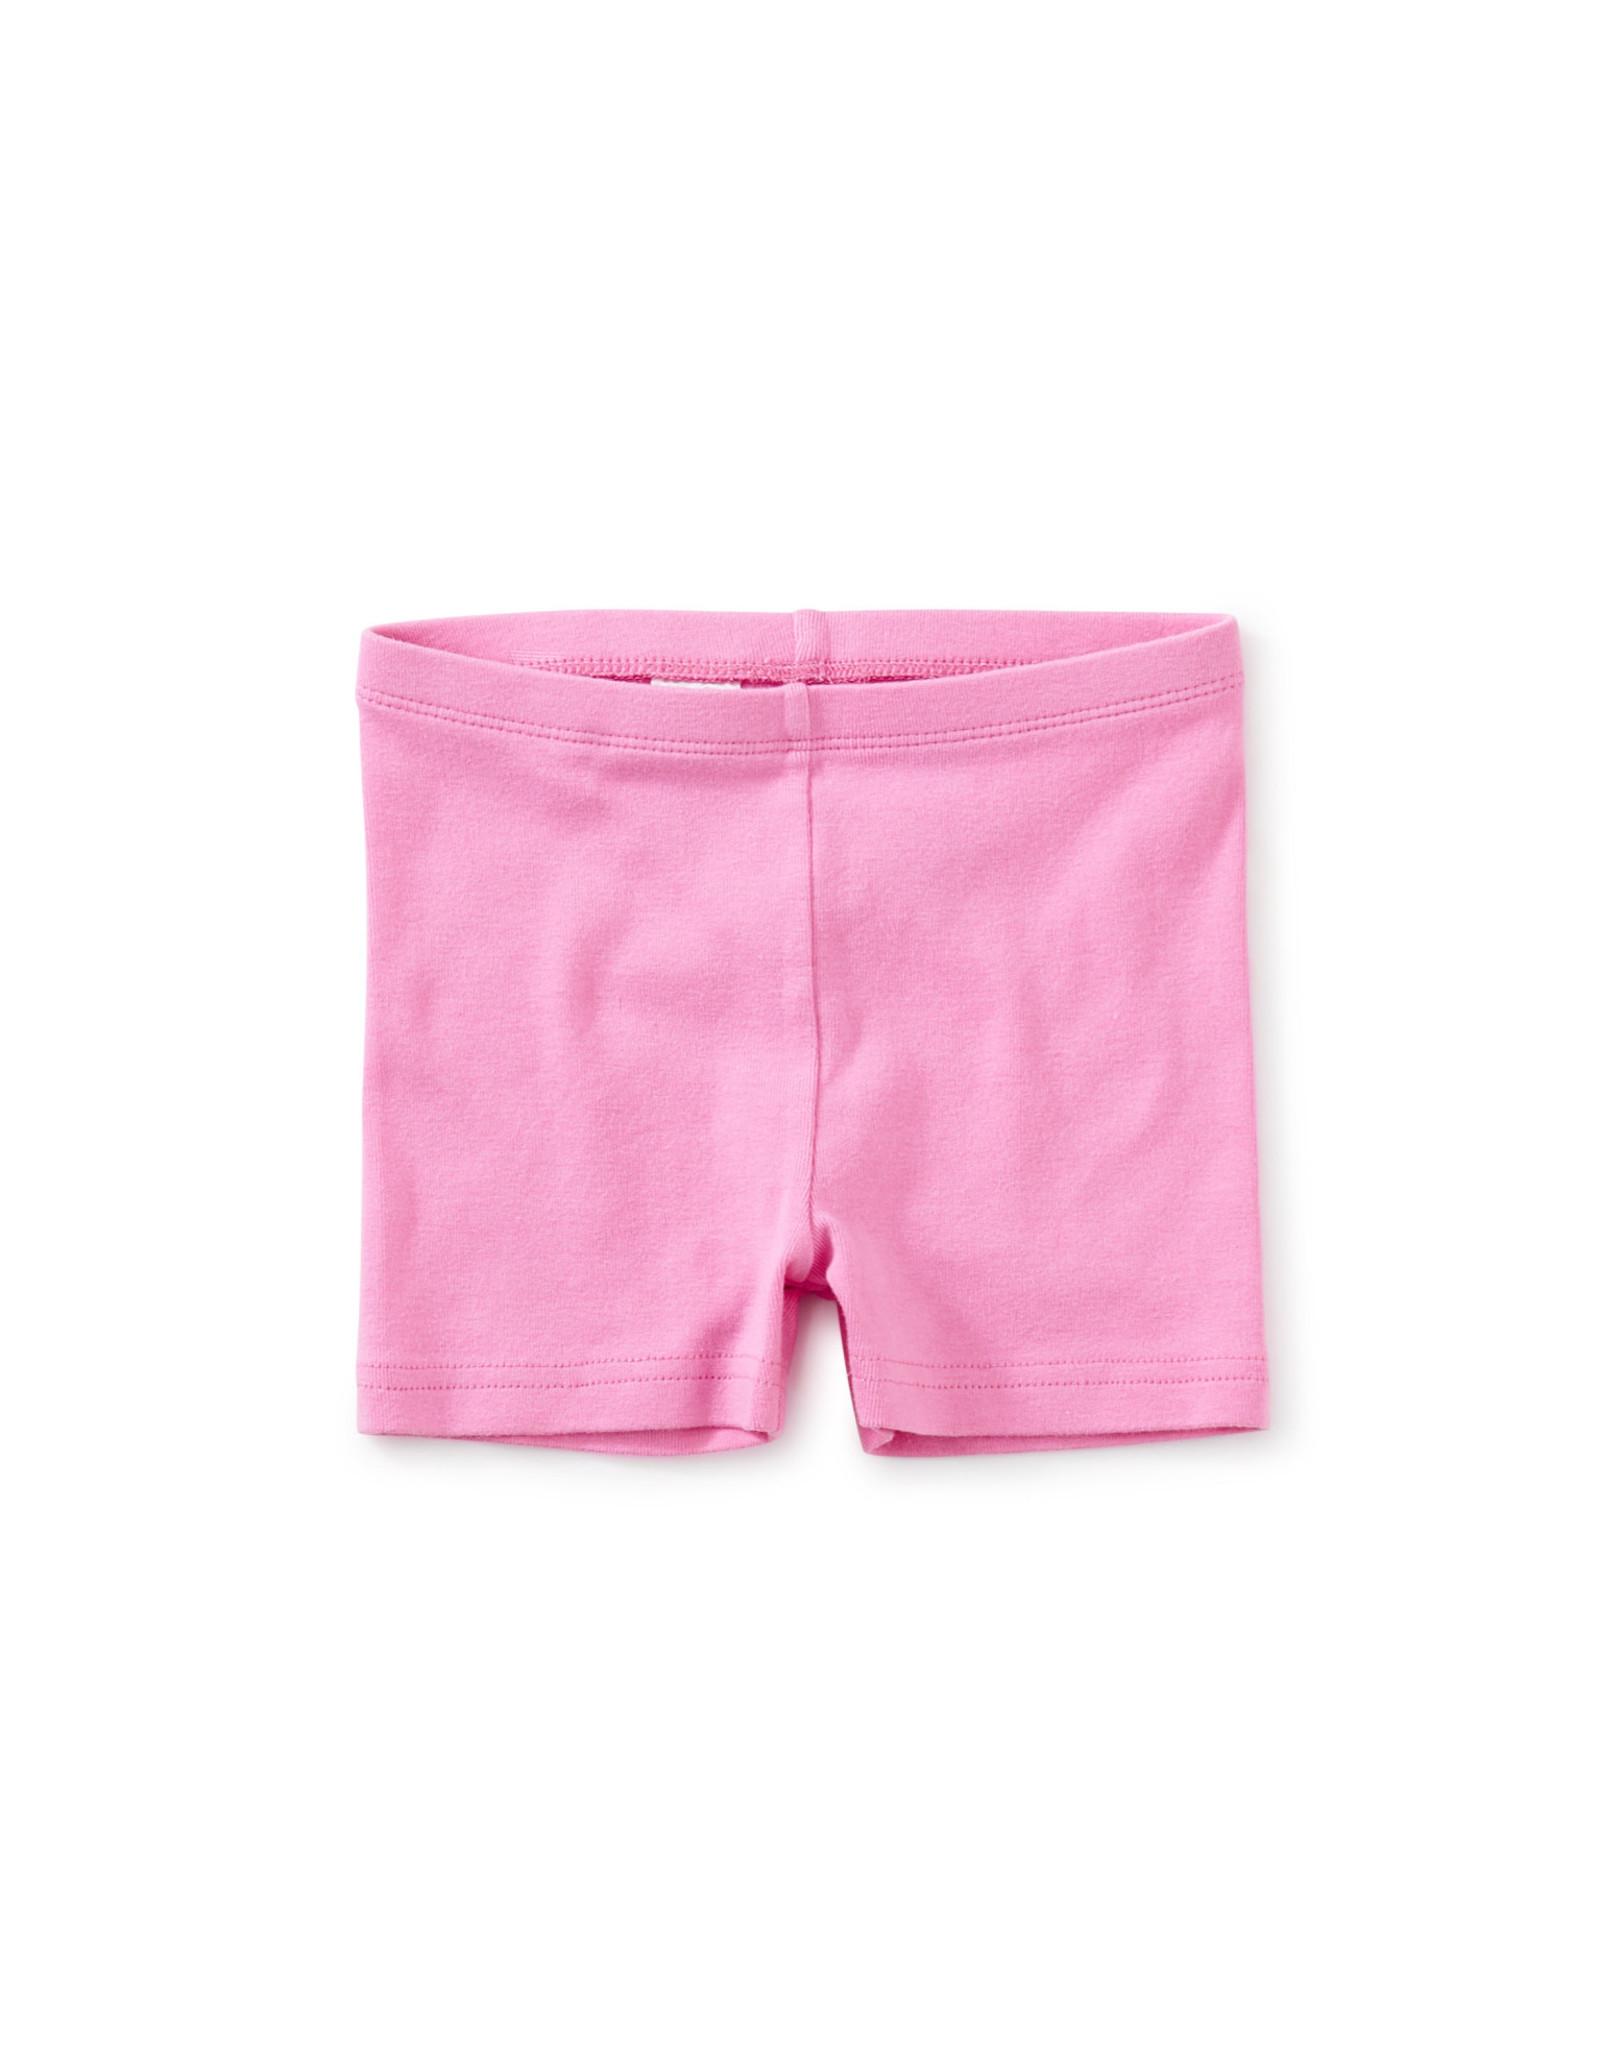 Tea Somersault Shorts, Perennial Pink